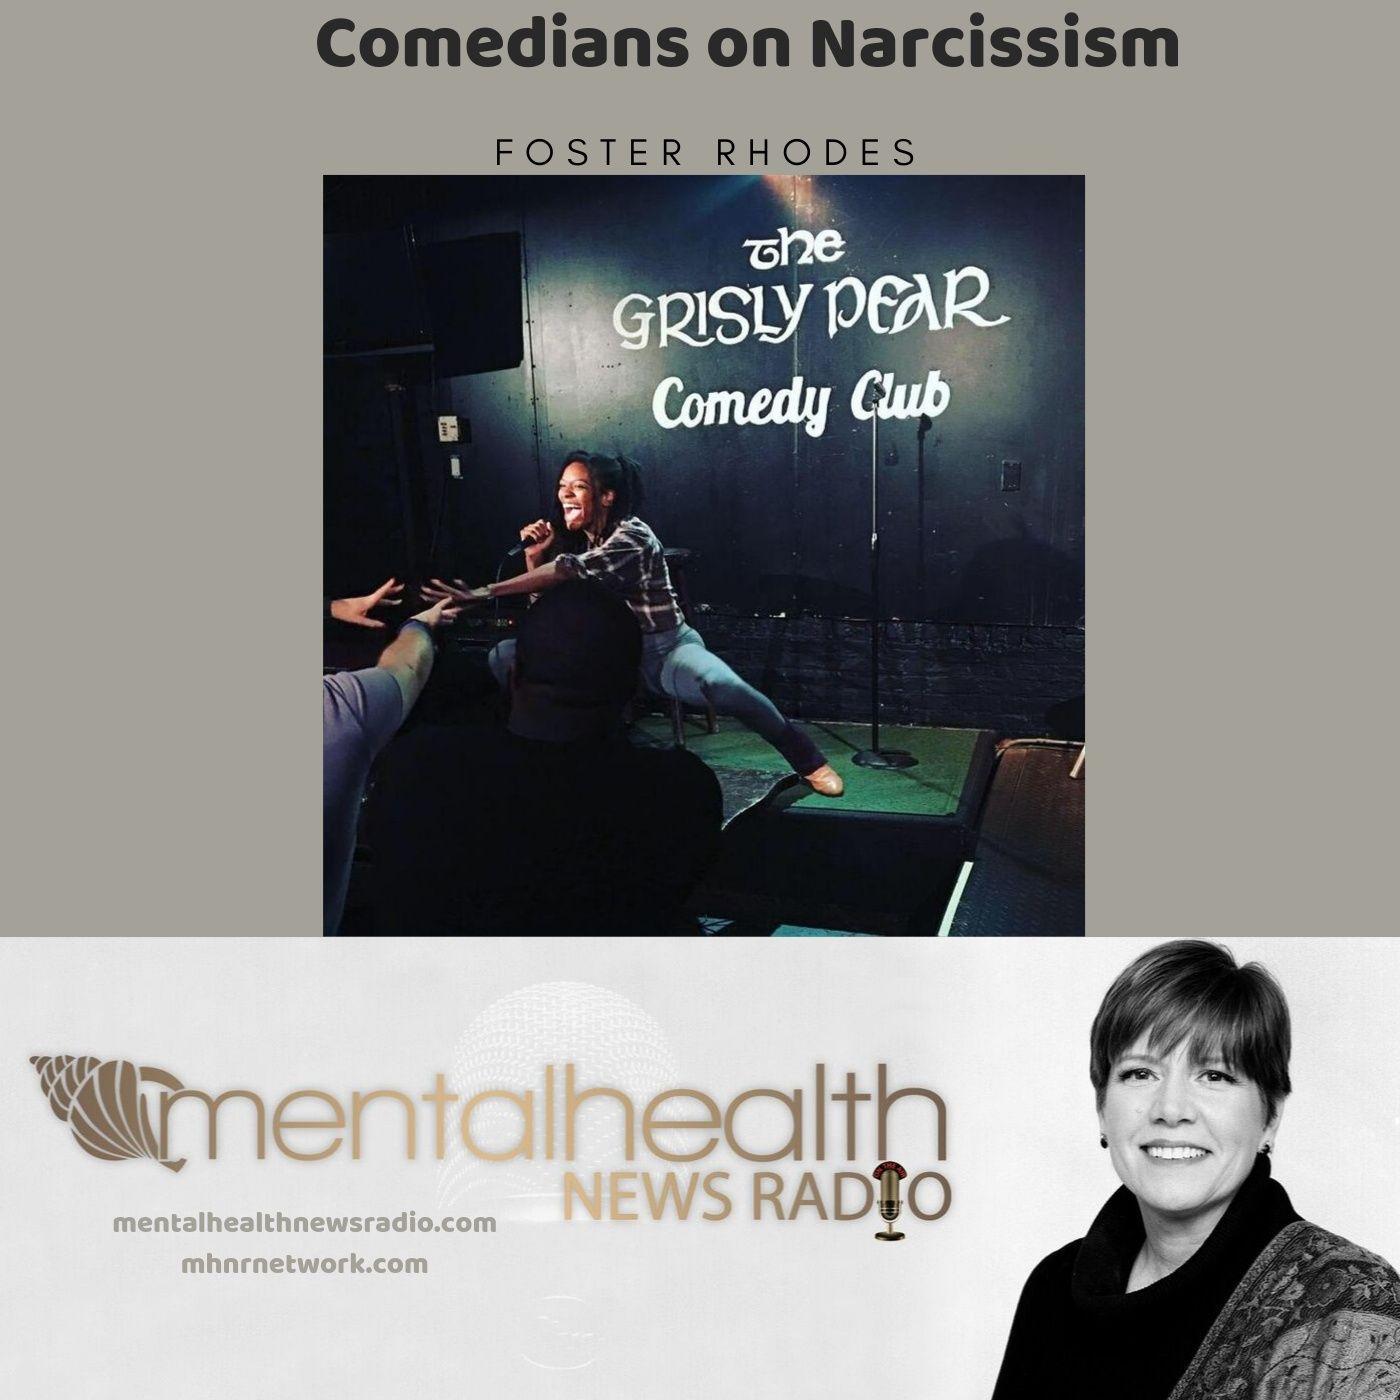 Mental Health News Radio - Comedians on Narcissism